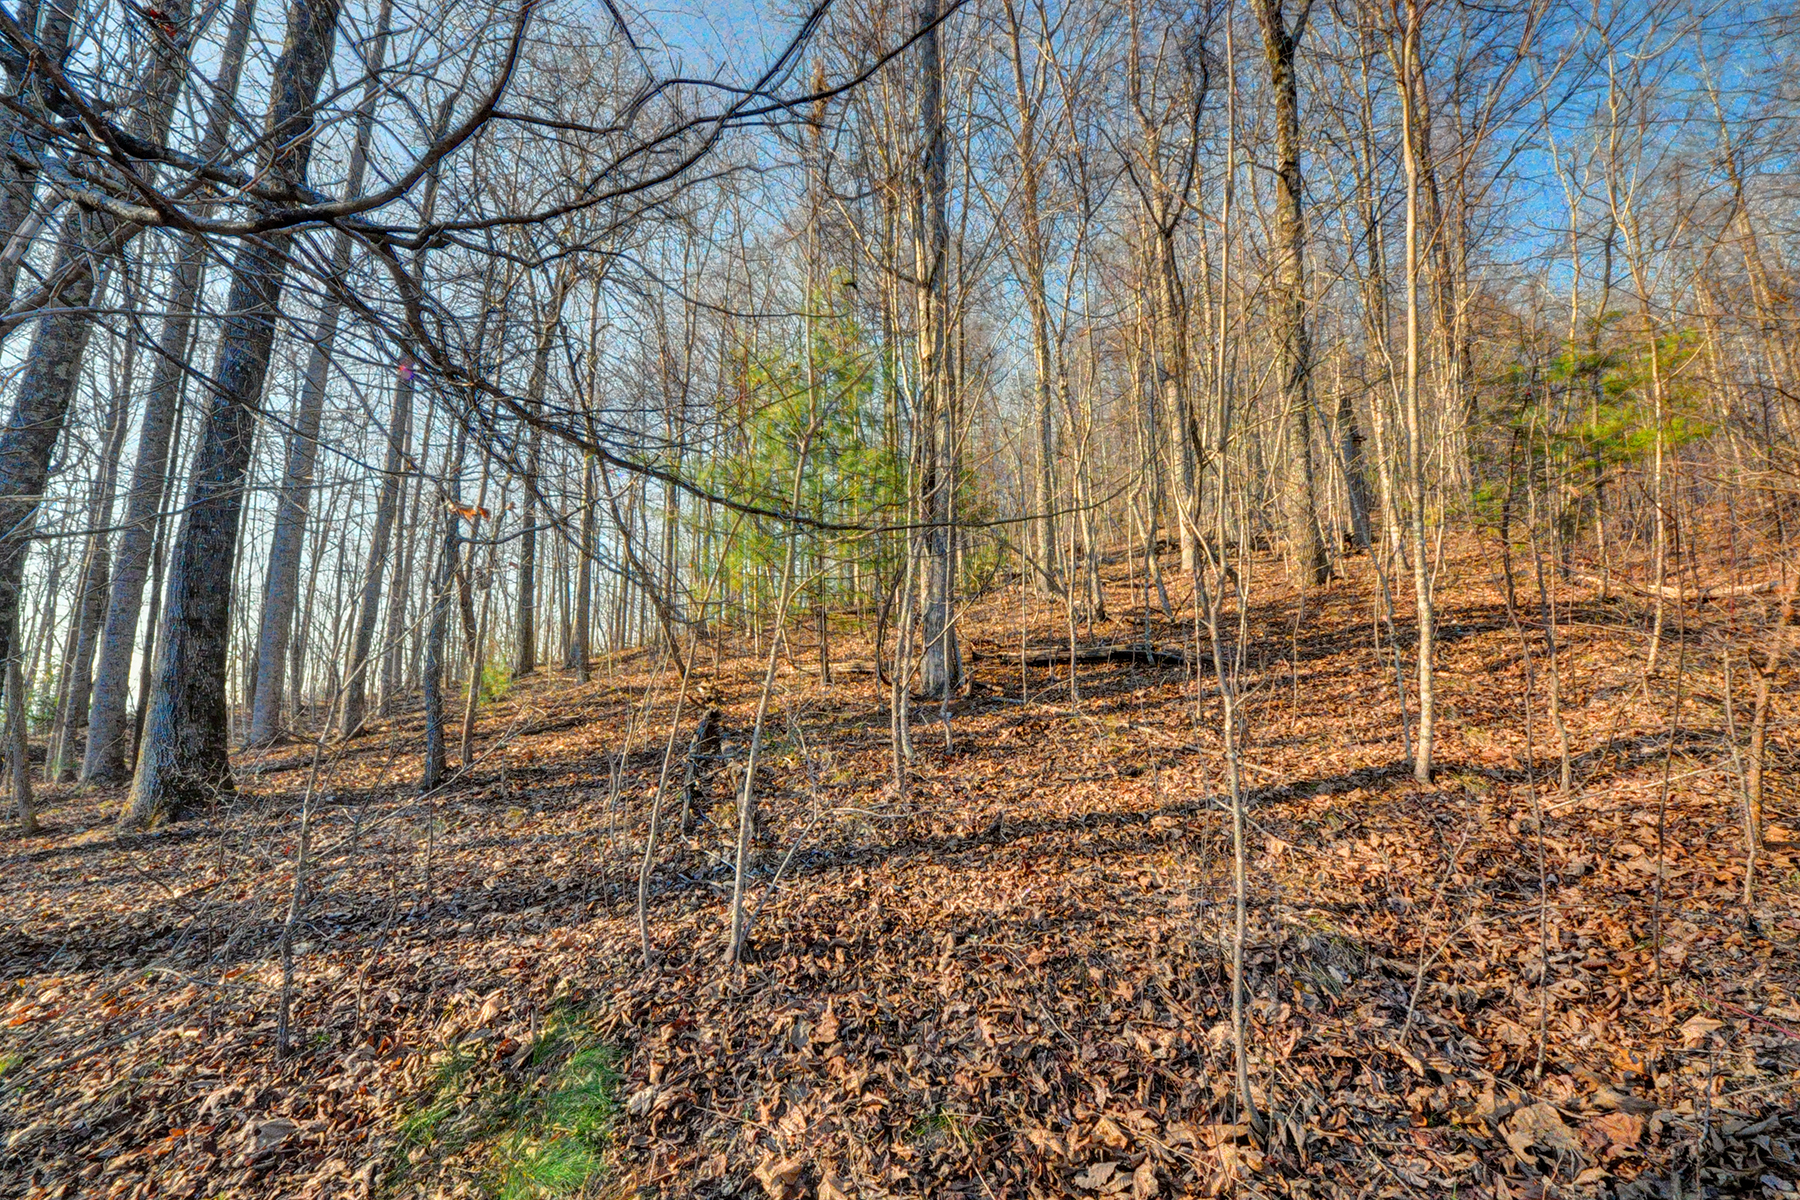 Land for Sale at OLETA FALLS 527 Overlook Park Dr 78 Phase II Hendersonville, North Carolina, 28792 United States